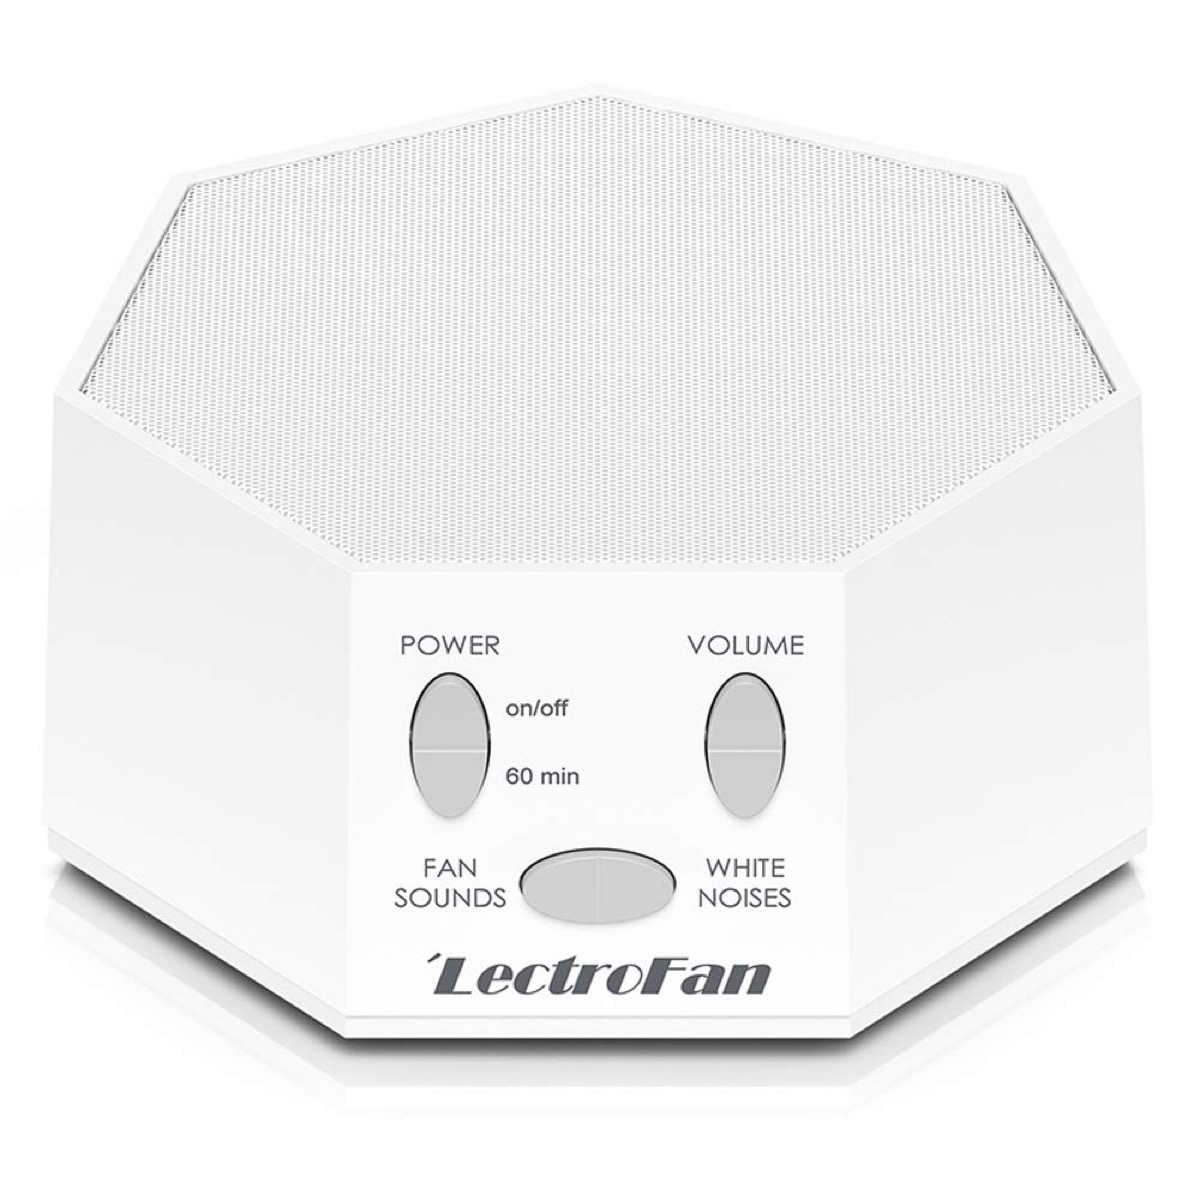 lectrofan high fidelity machine